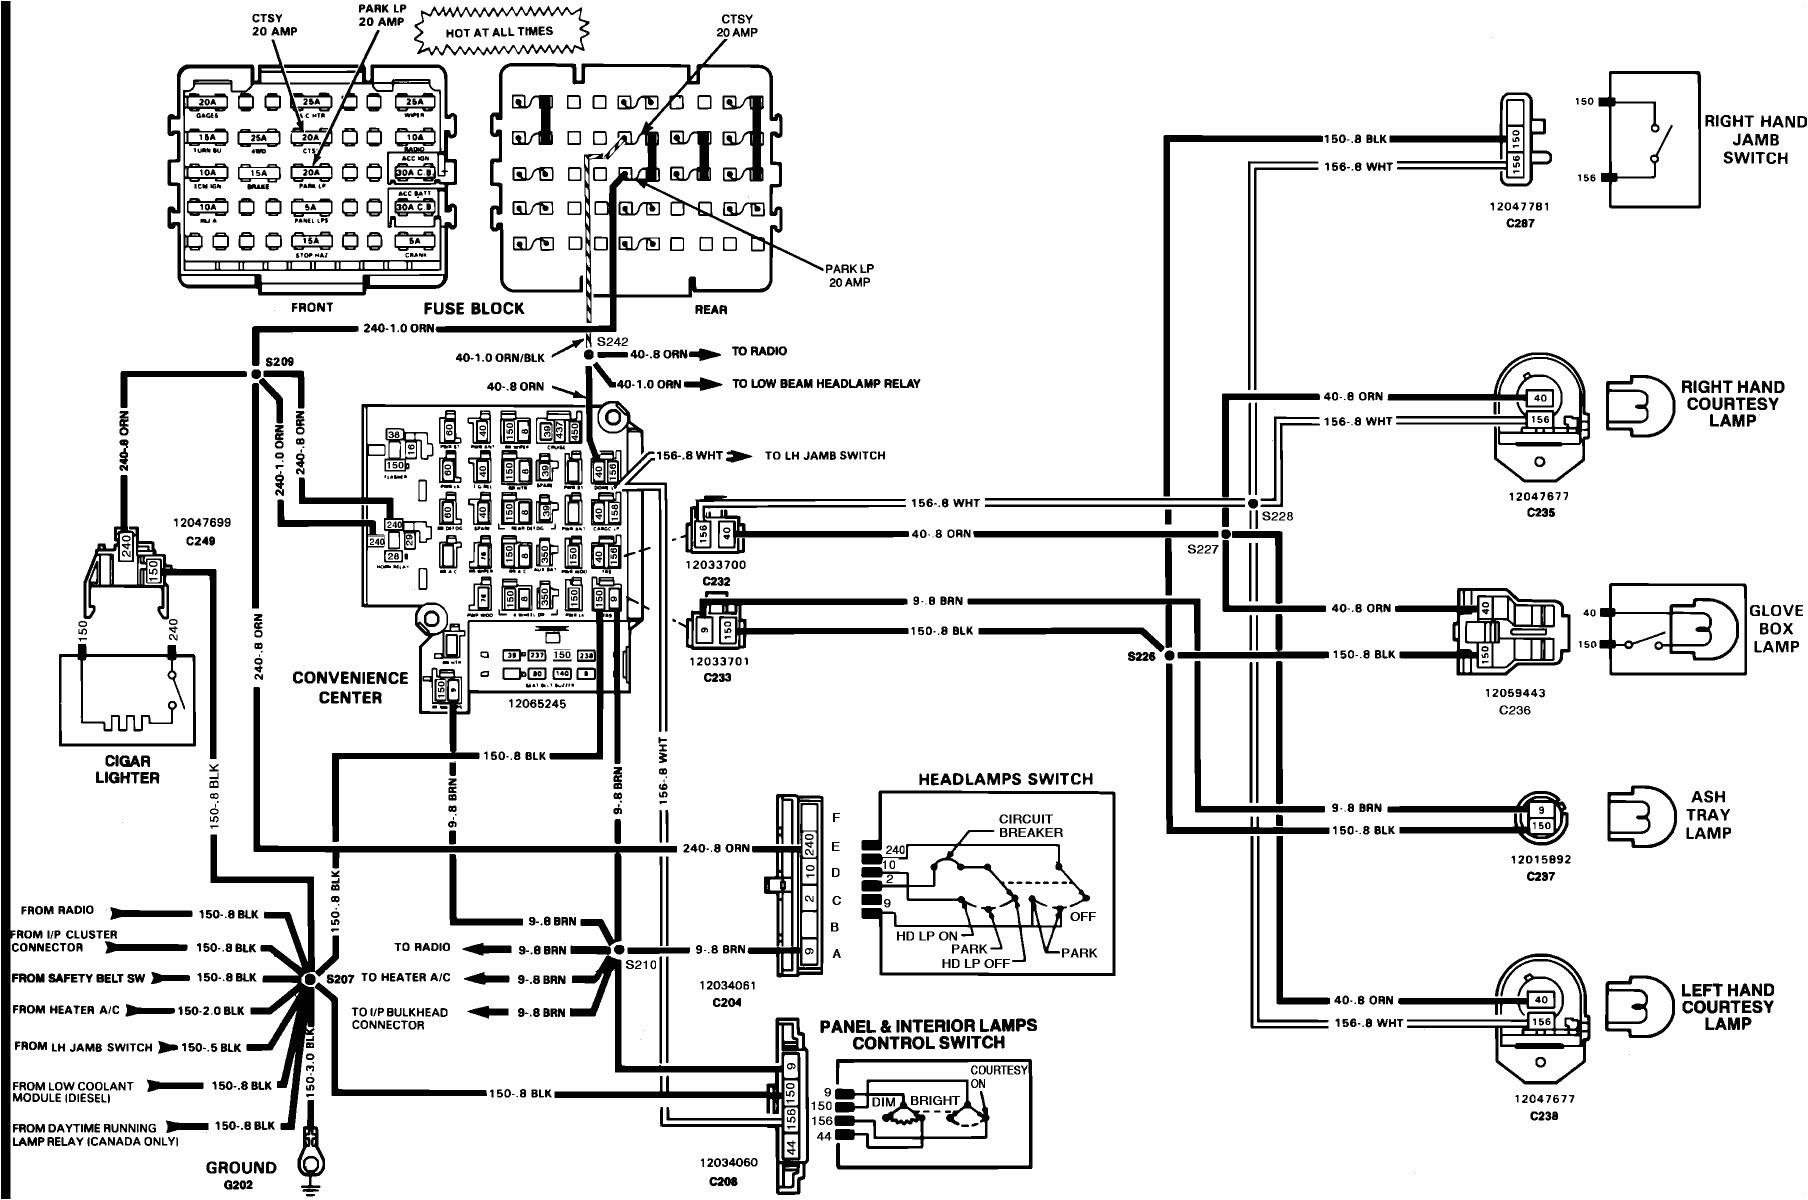 wiring diagram 65c 10 truck wiring diagram blog truck wiring harness moreover m for hho generator circuit diagram